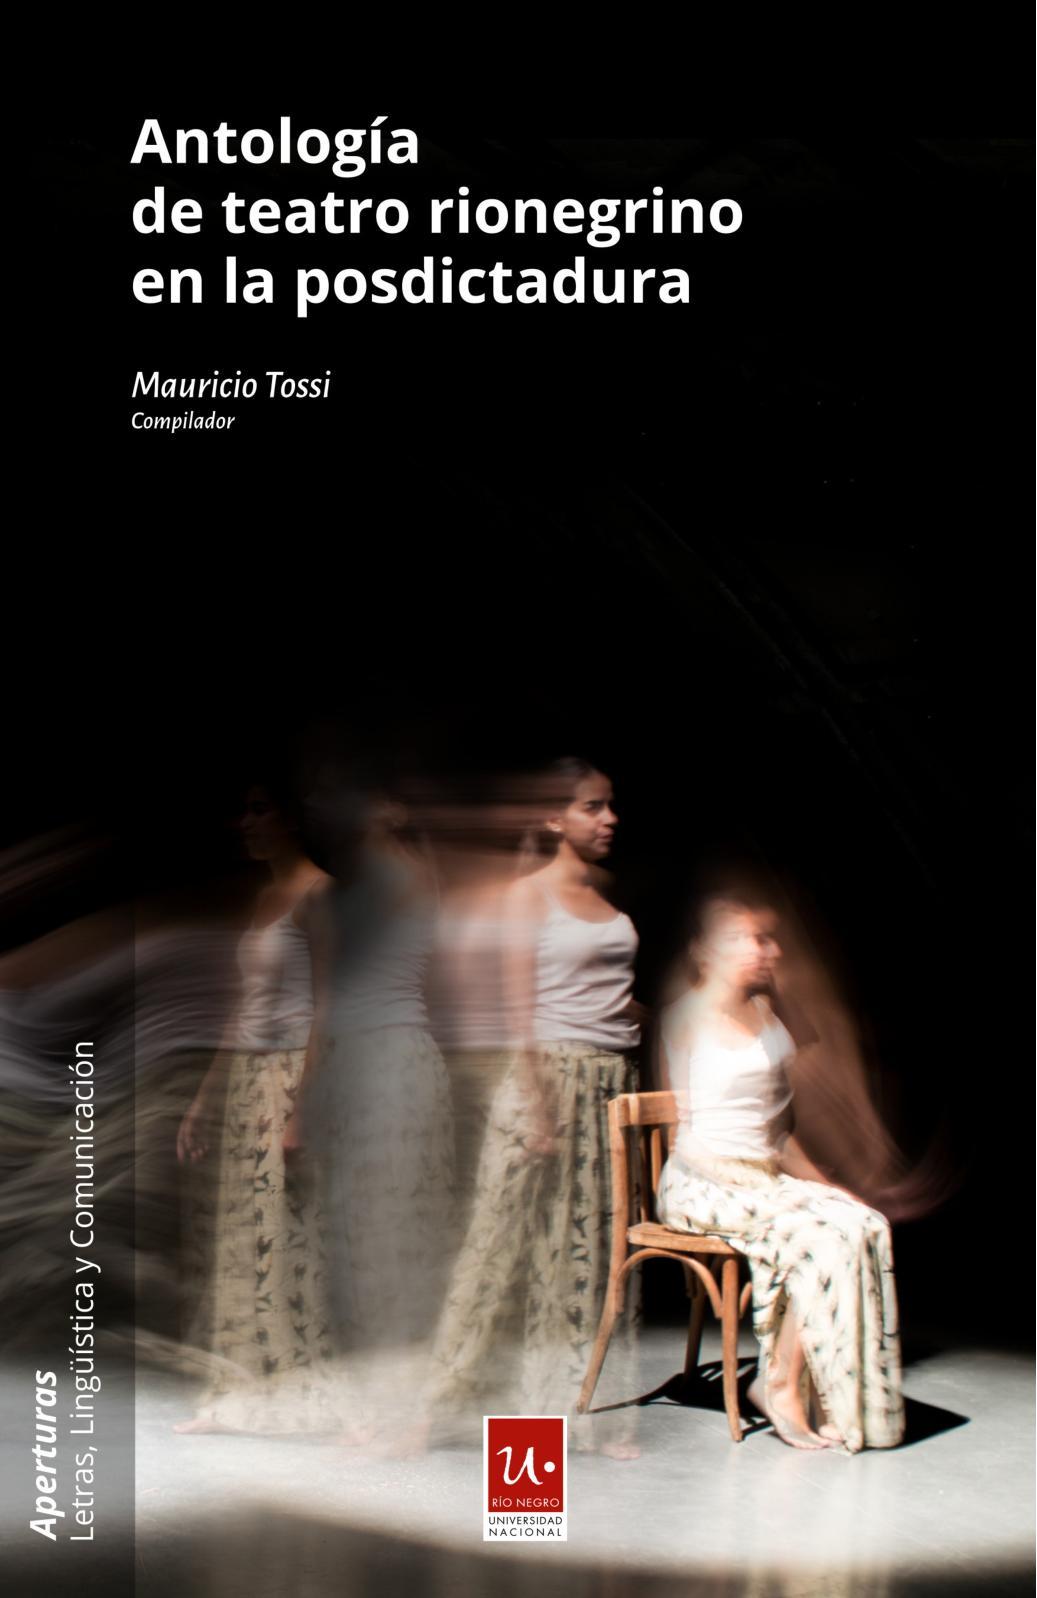 9b8e28277a3ad Calaméo - Antologia de teatro rionegrino en la posdictadura